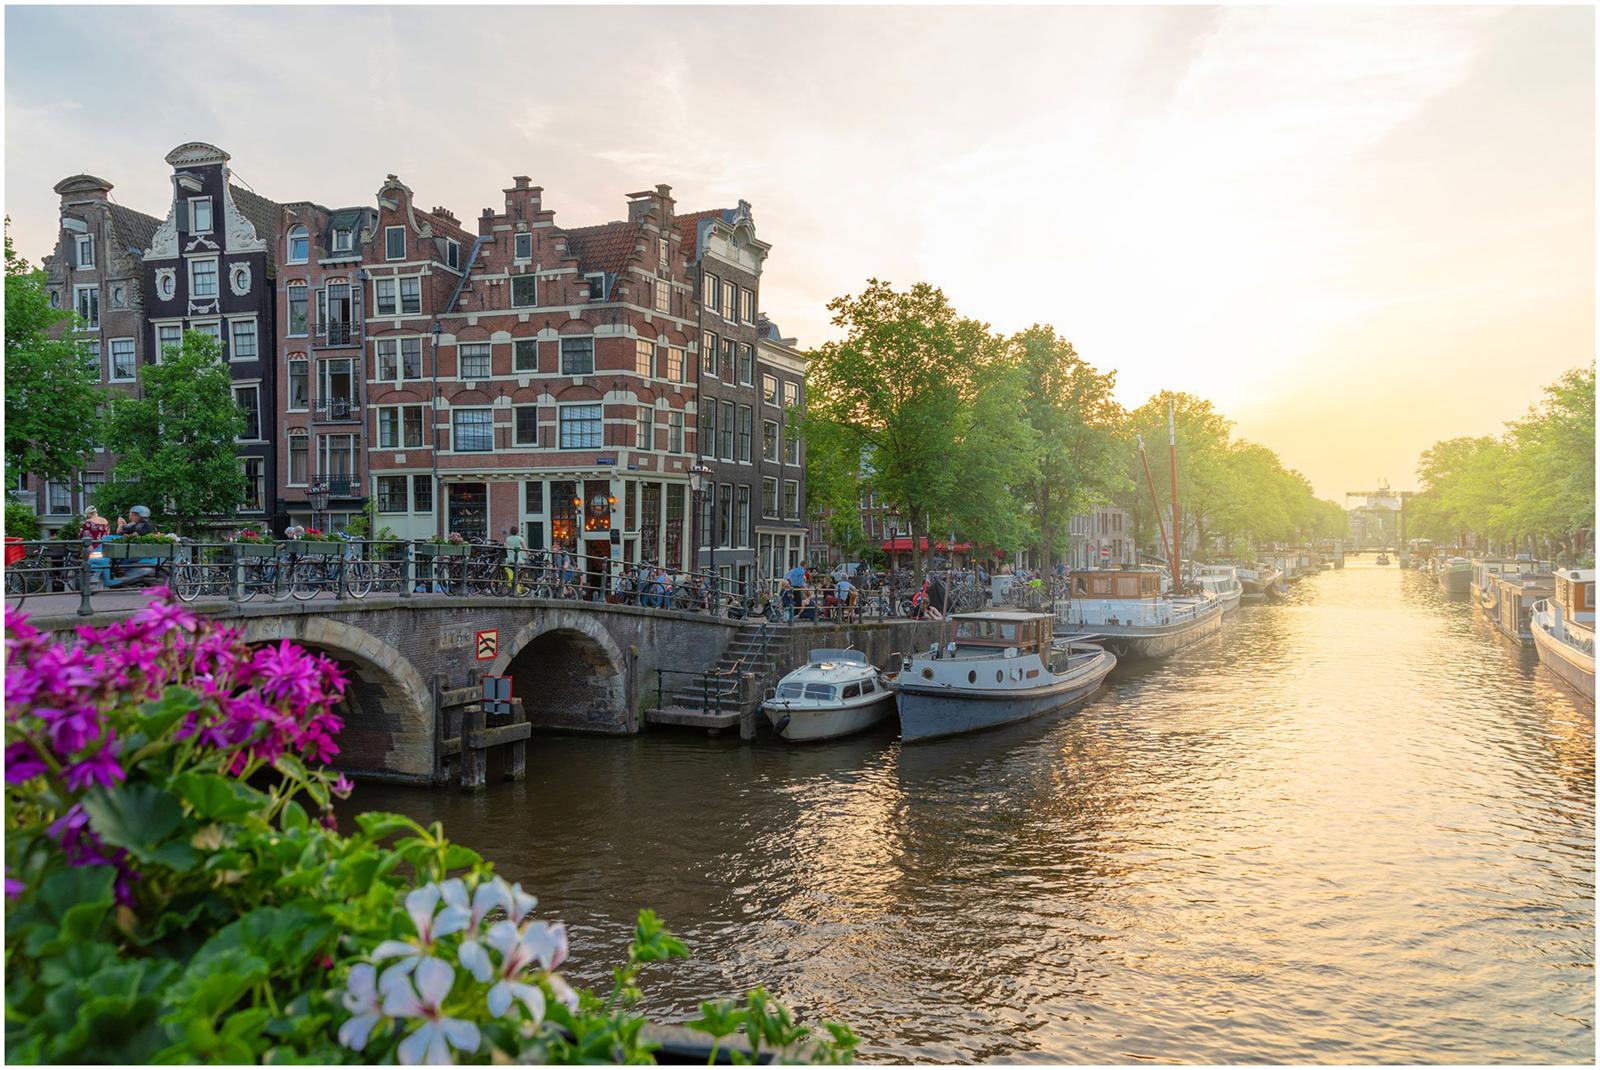 Honeymoon Travel Couples' Getaway | Crystal River Cruises | Bach Enchanting Moselle | Amsterdam